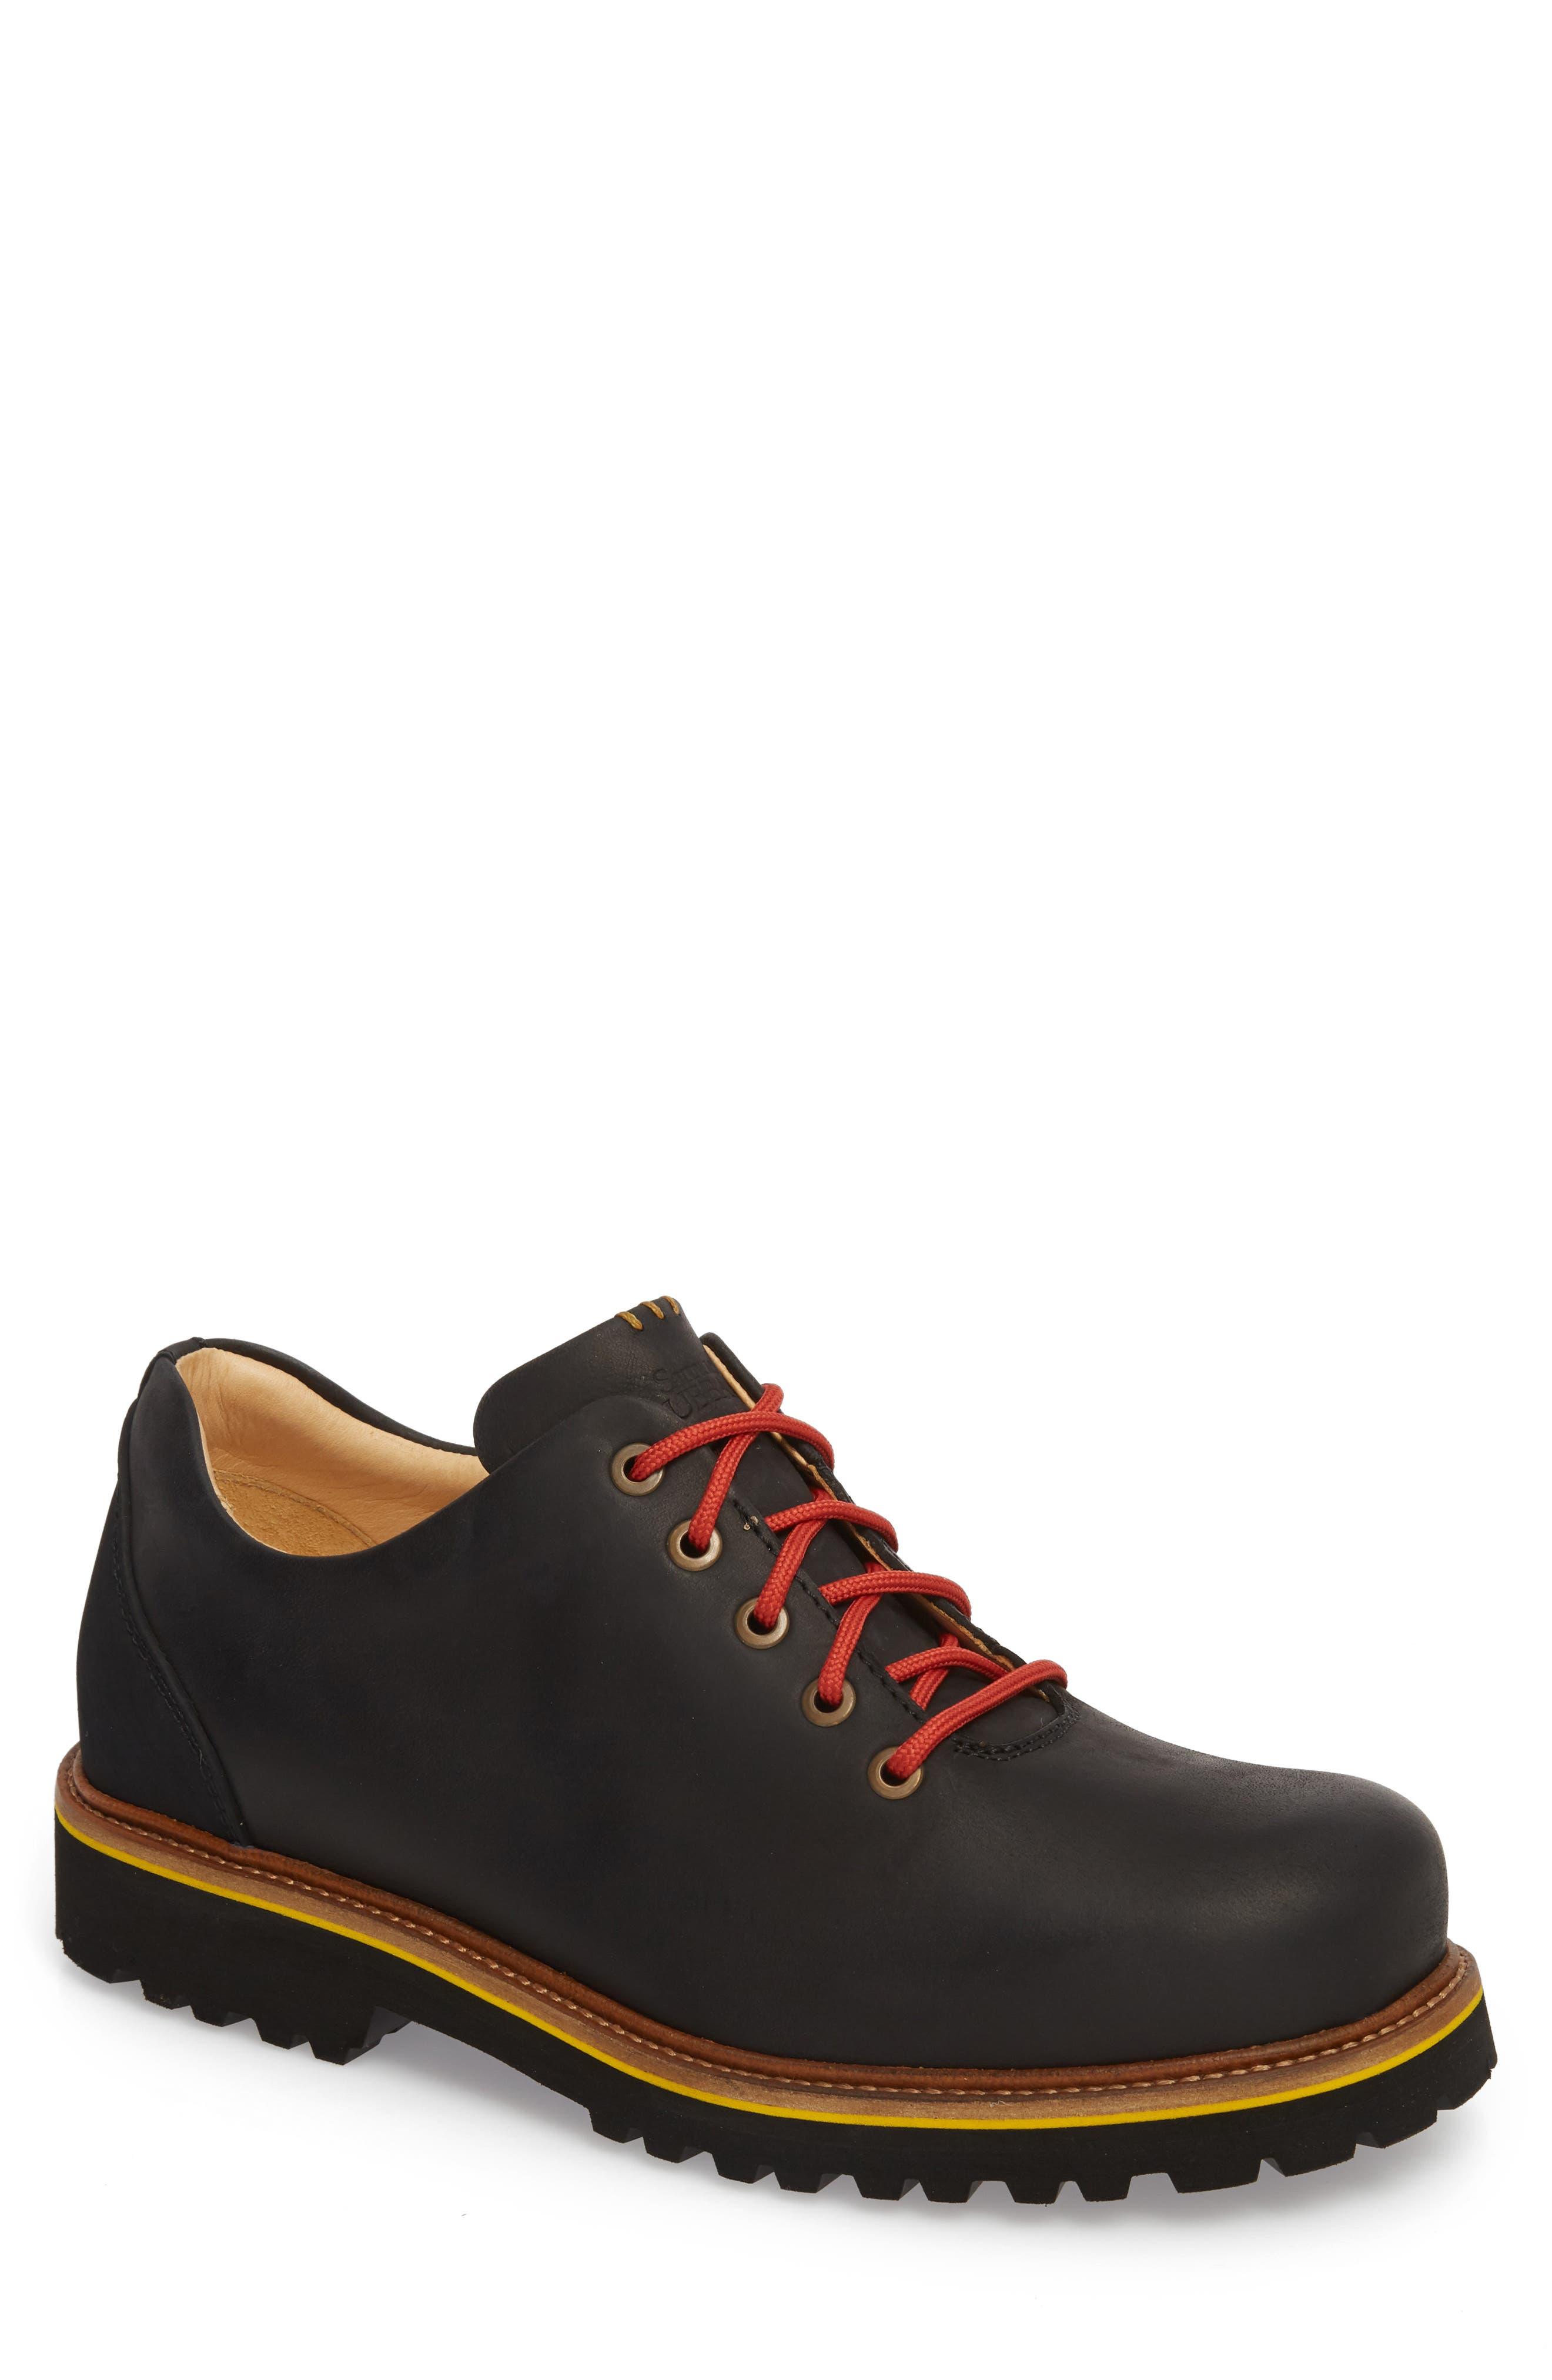 Fresh Plain Toe Oxford,                             Main thumbnail 1, color,                             BLACK WAXED LEATHER